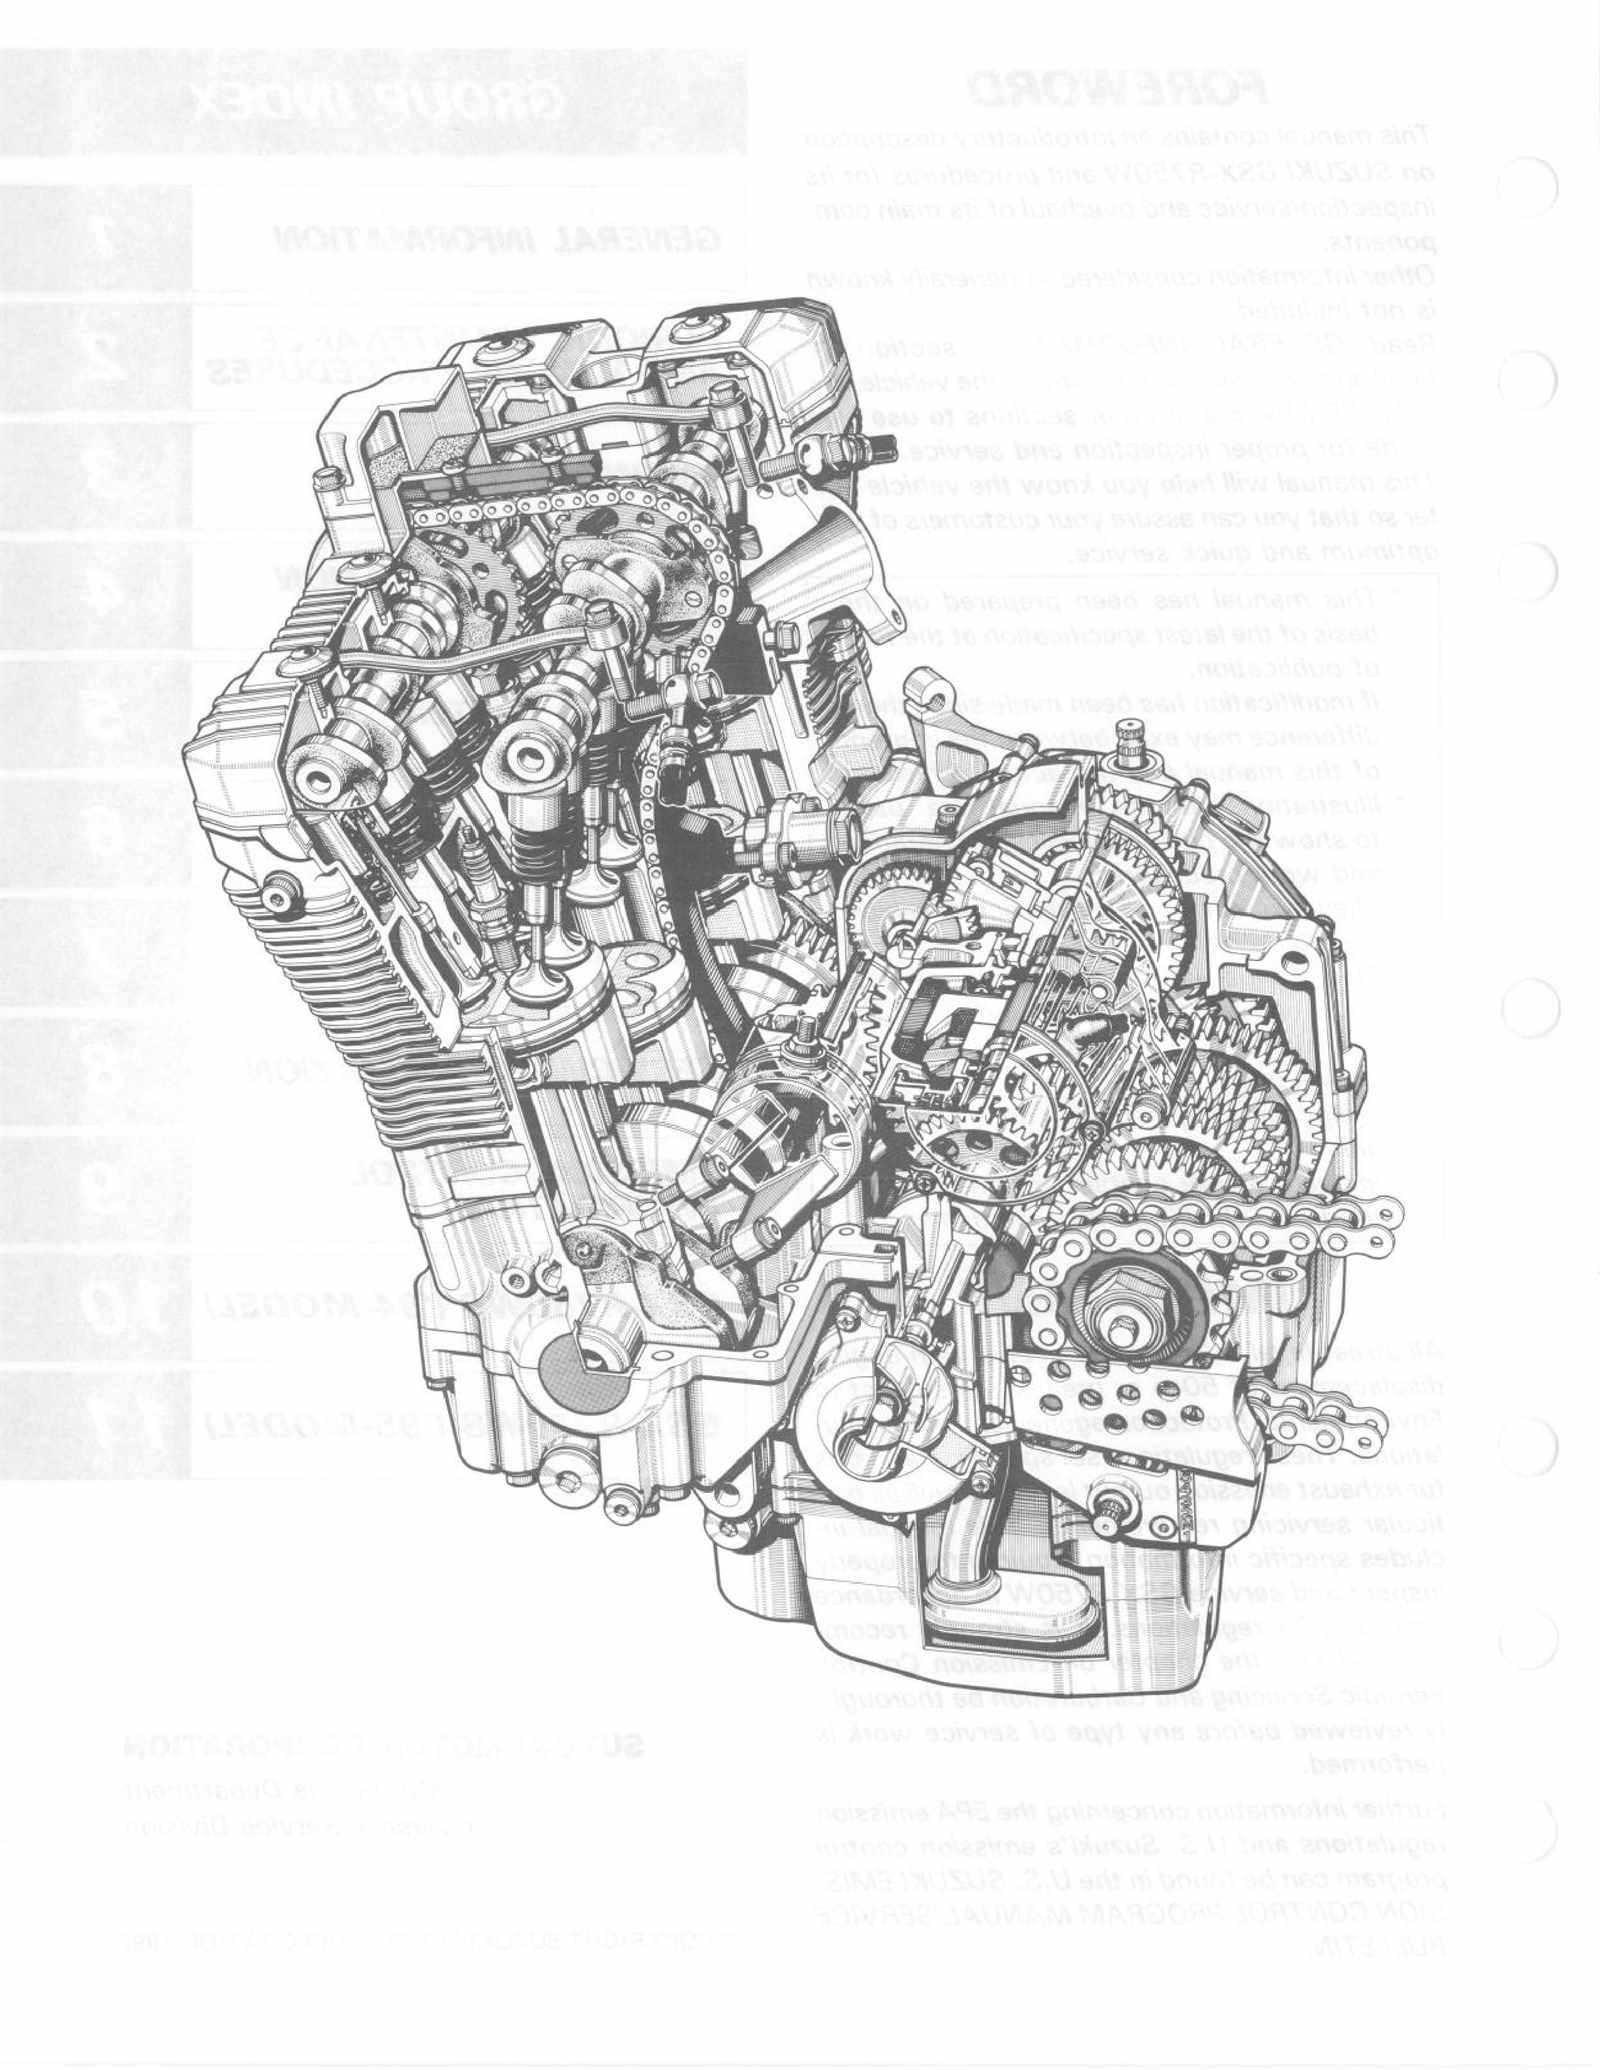 Suzuki GSX R750 W 93-95 Service Manual Free Download